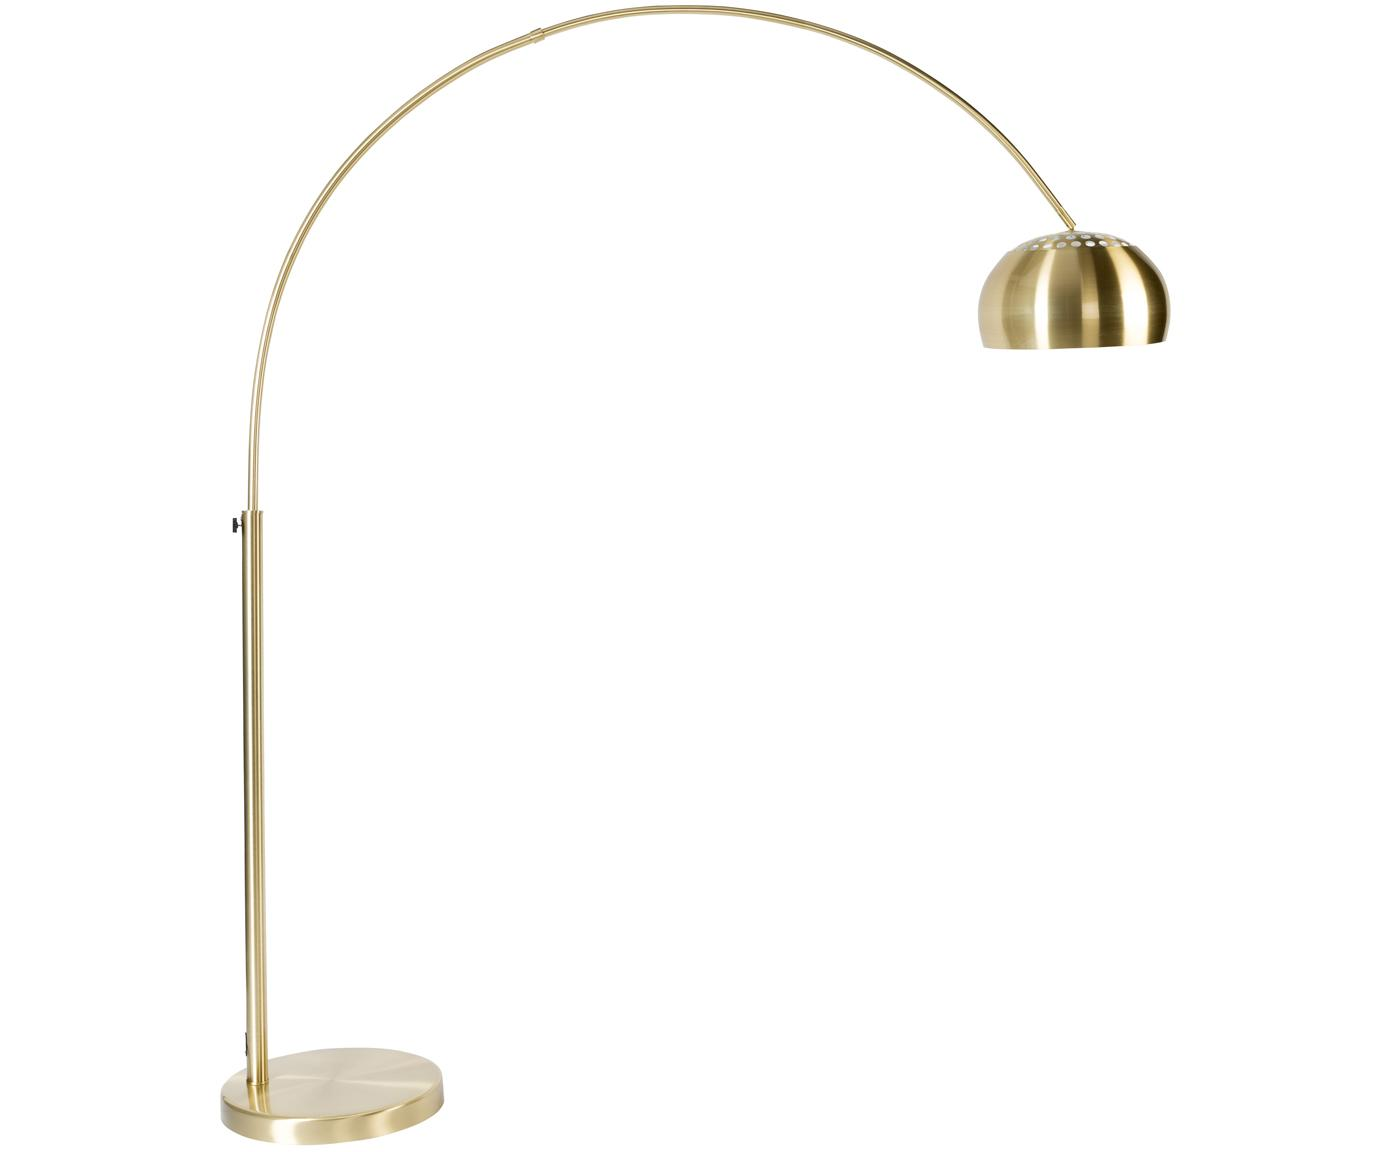 Lámpara arco Metal Bow, altura regulable, Cable: plástico, Latón, An 170 x Al 205 cm